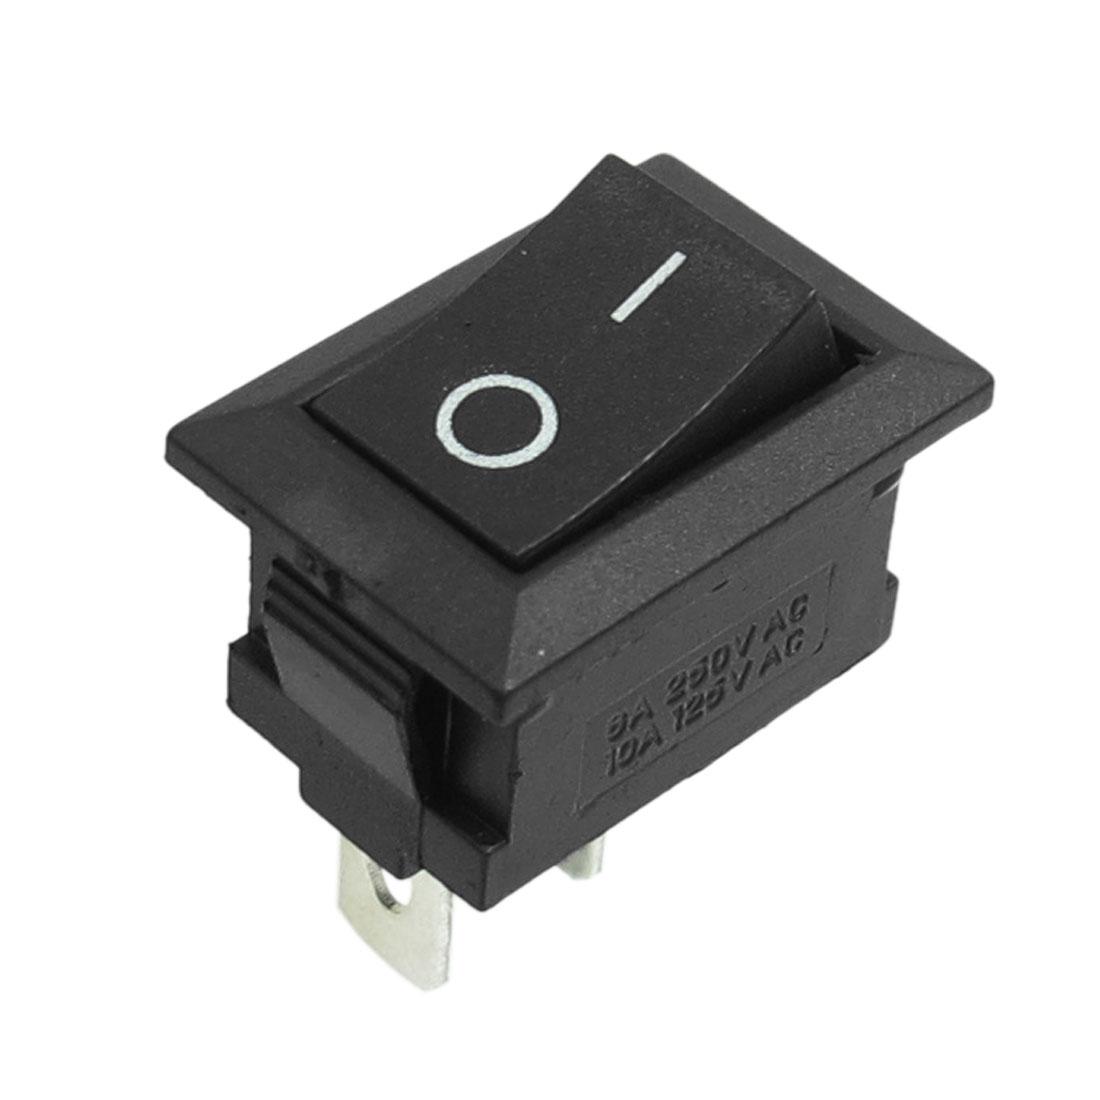 Electric Tool AC 250V 6A / AC 125V 10A SPST O/I 2-Position Rocker Switch